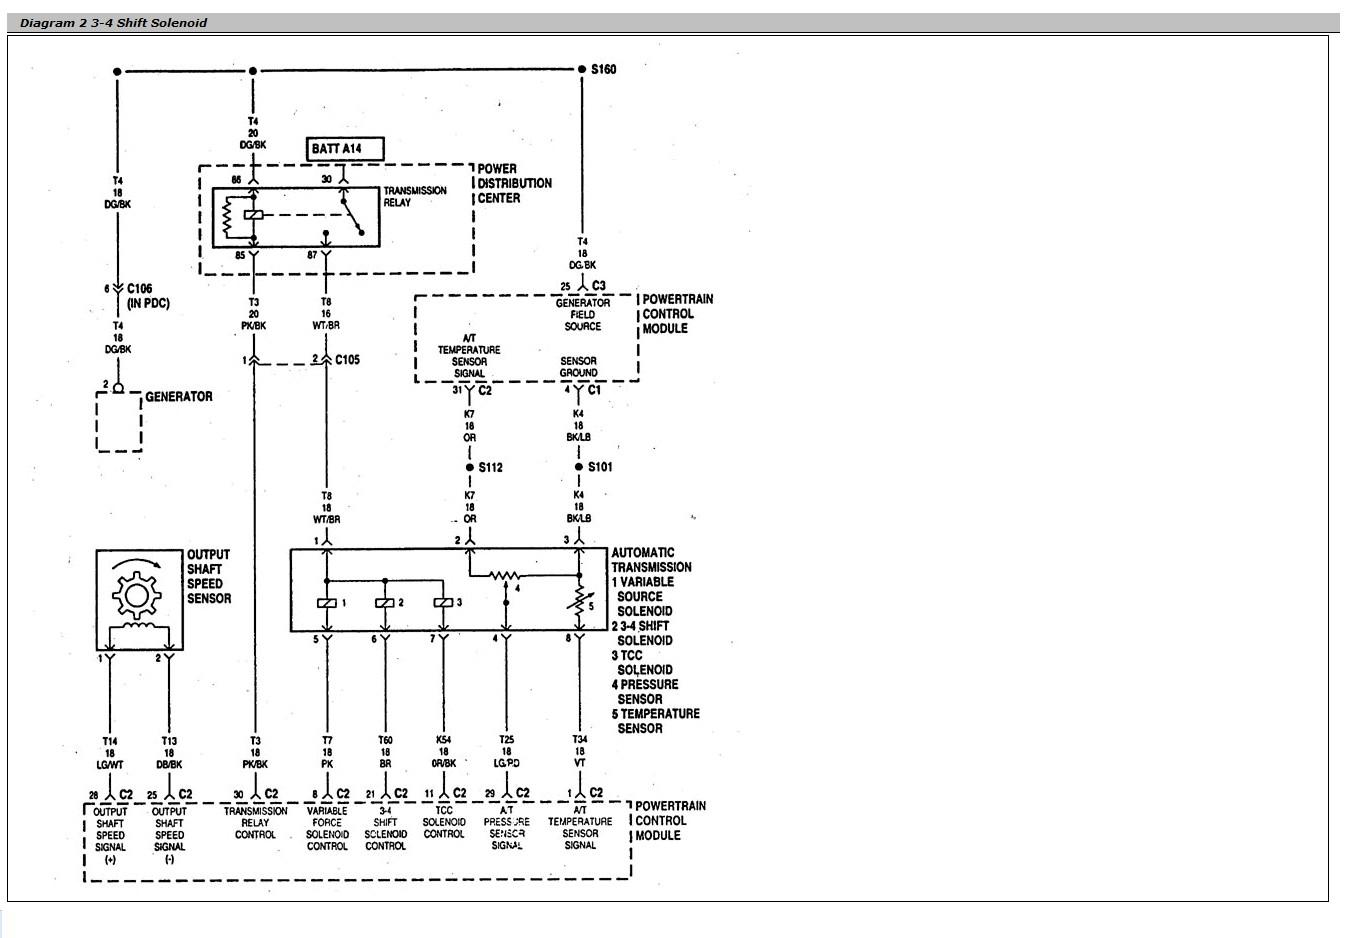 2001 dodge durango wiring diagram nordyne electric furnace best site harness